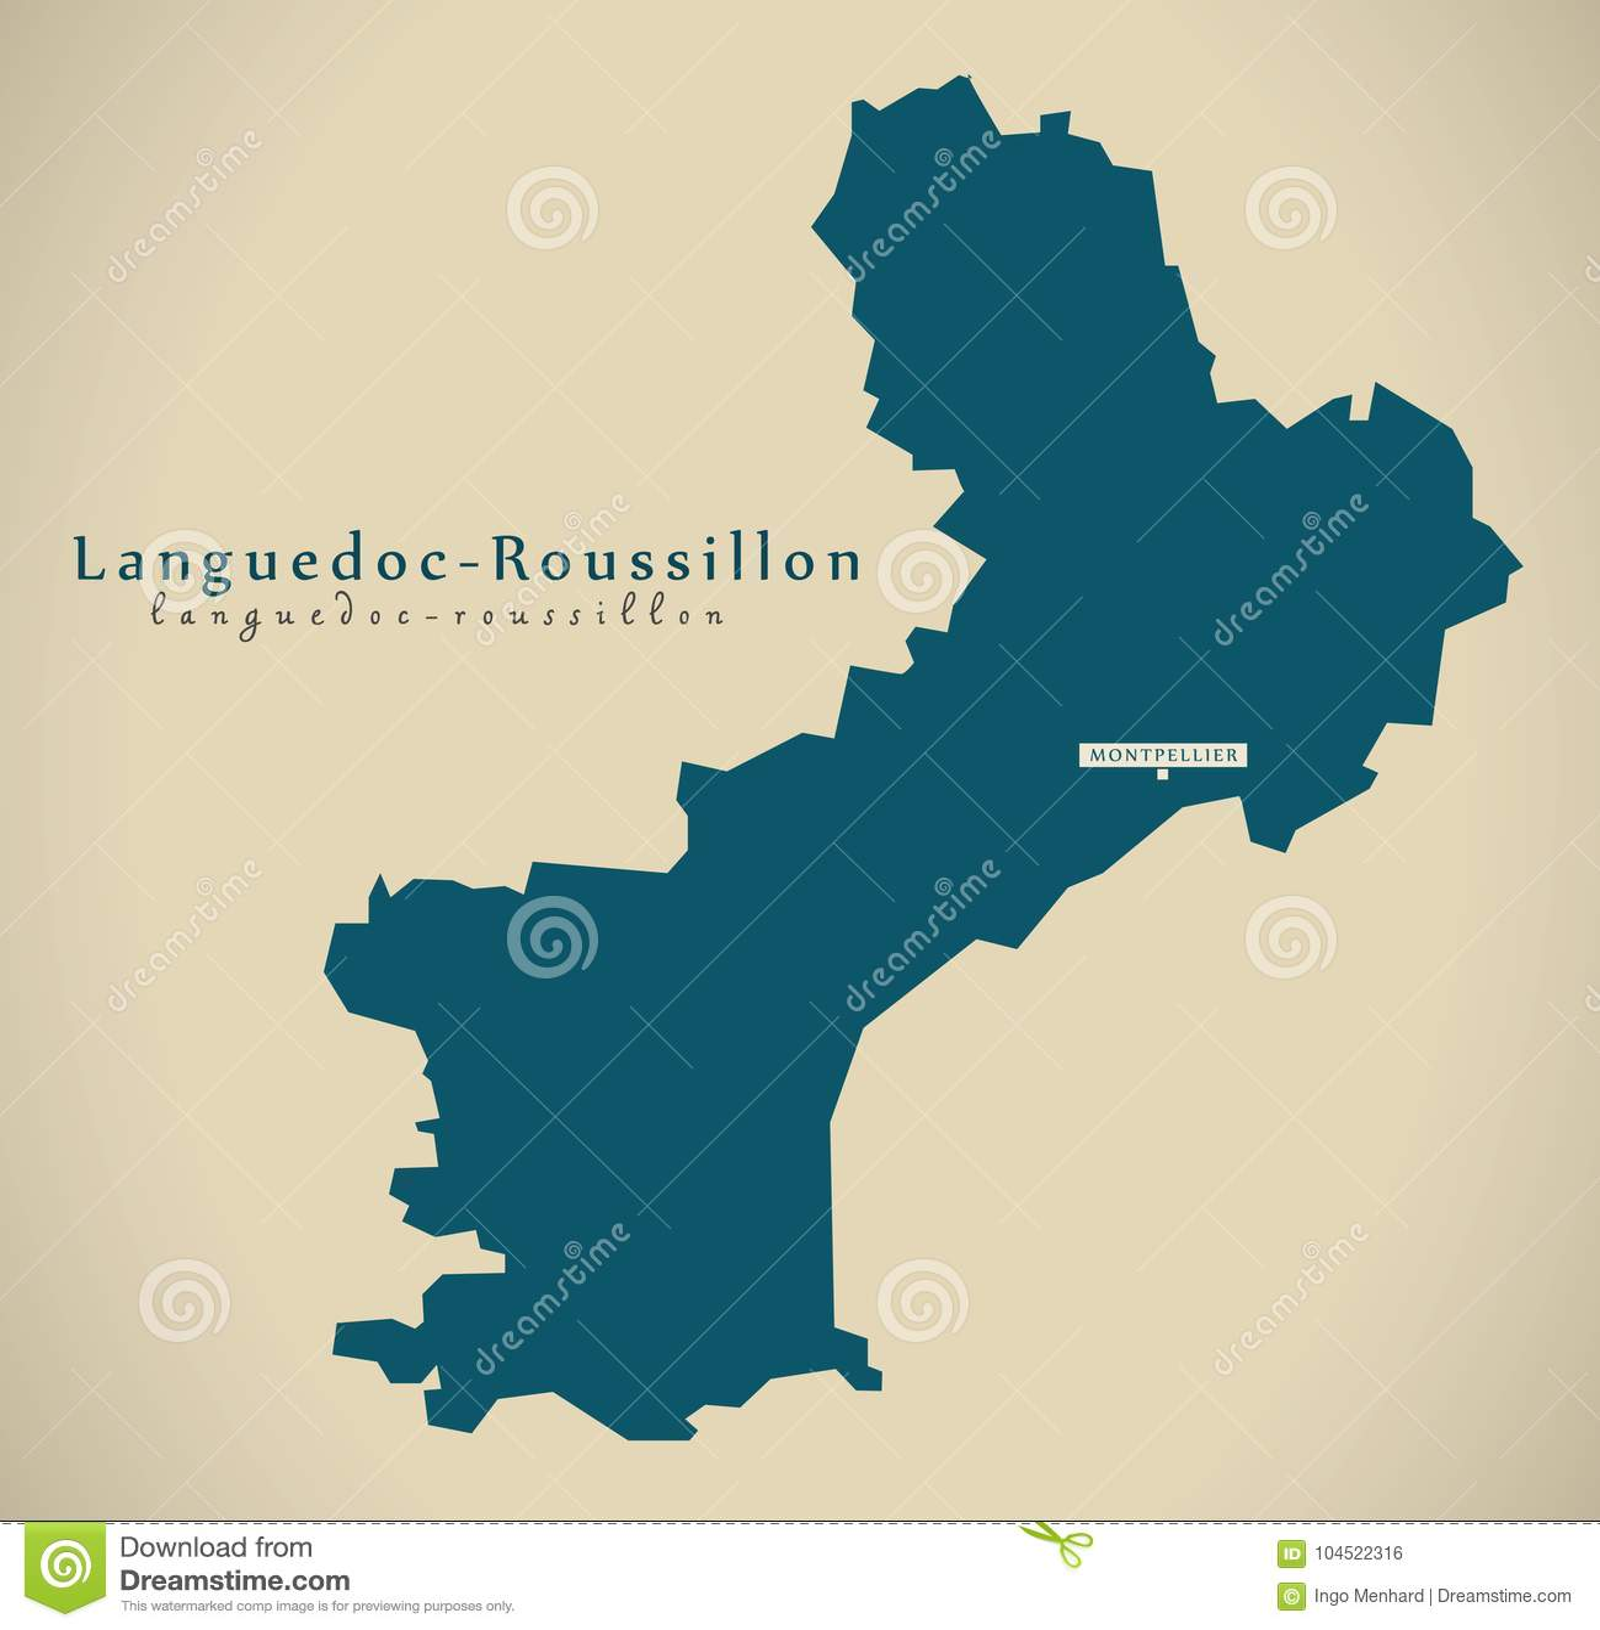 Carte Languedoc Roussillon.Carte Moderne France Franc De Languedoc Roussillon Illustration